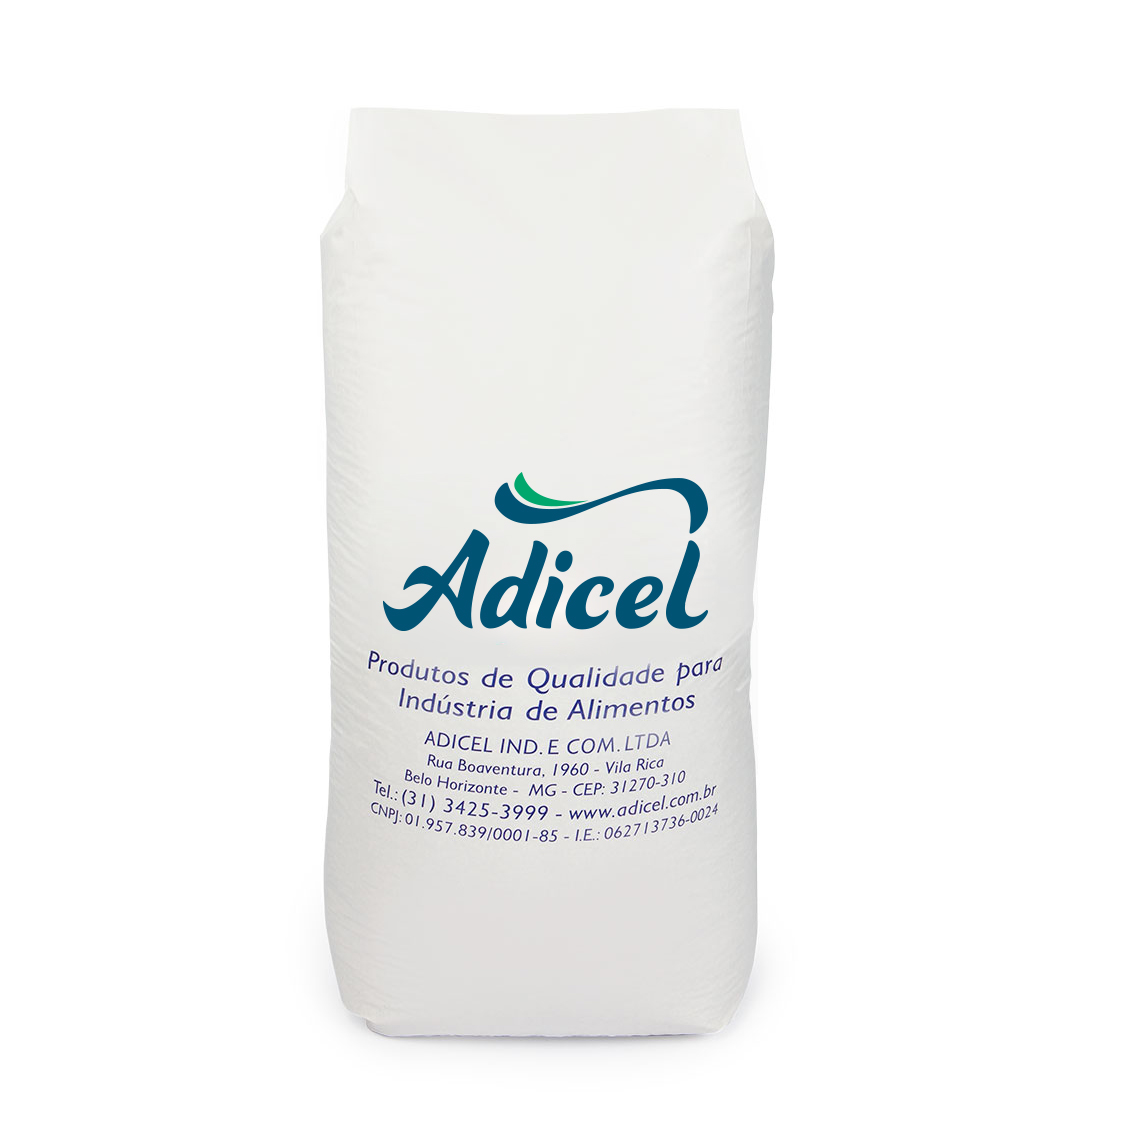 Proteína Texturizada De Soja Cor Clara Tamanho Pequeno Saco - 20 kg